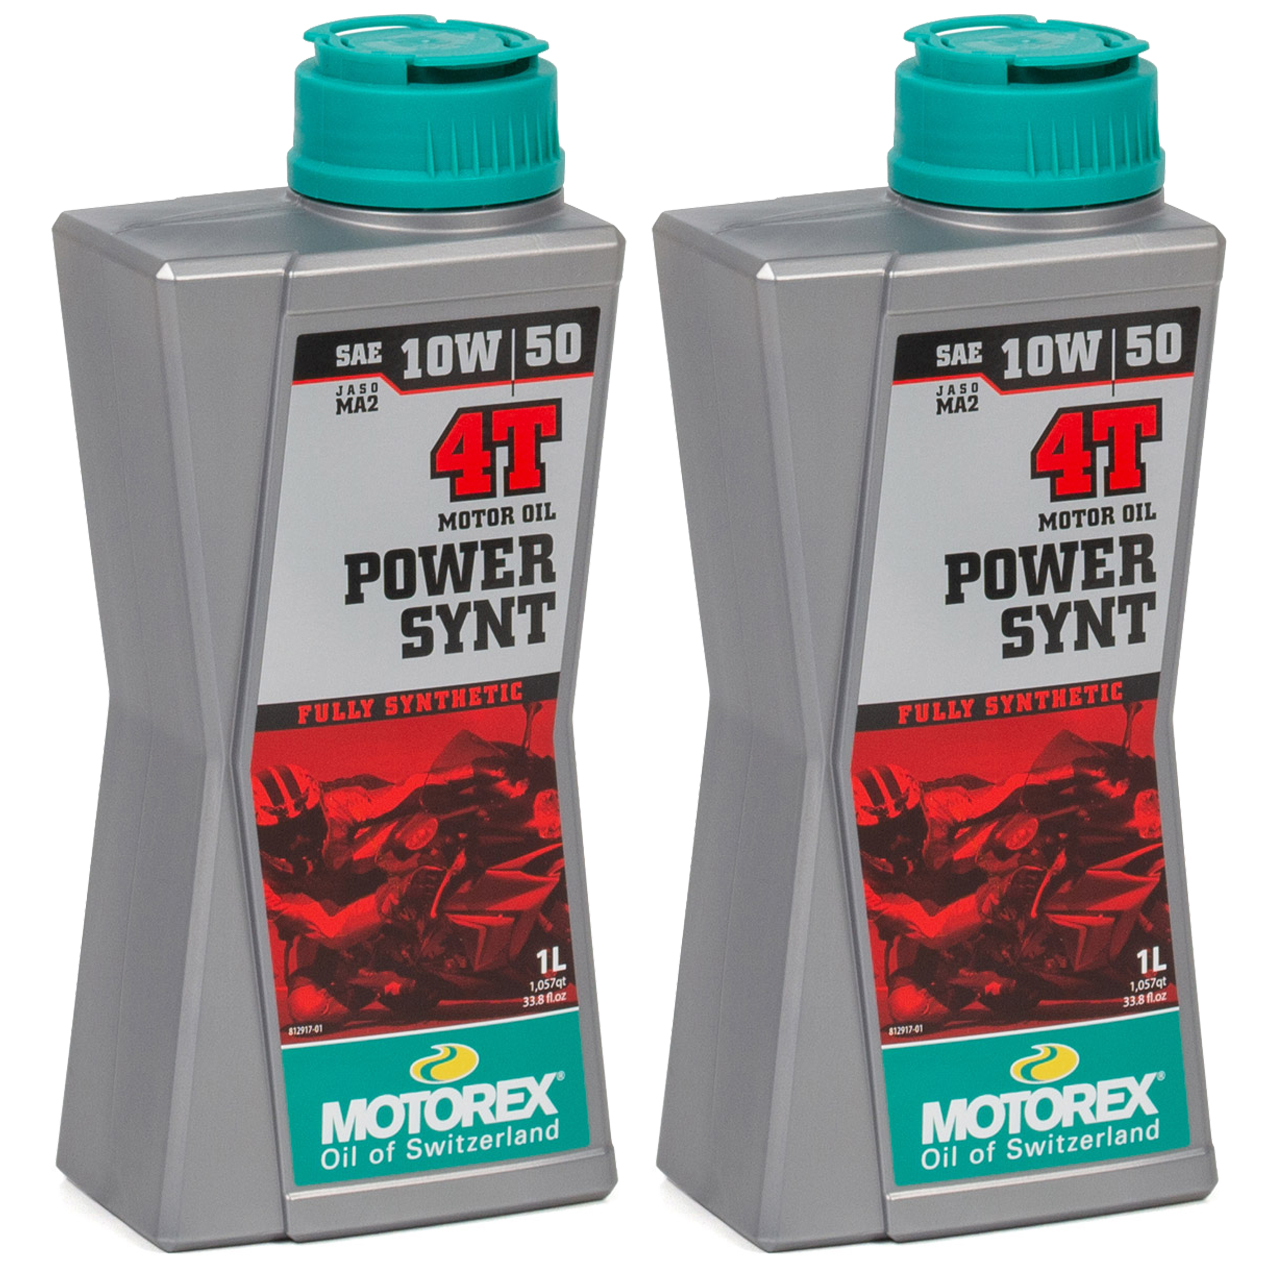 MOTOREX Power Synt 4T Motoröl Öl 10W50 JASO MA2 API SN/SM/SL - 2L 2 Liter